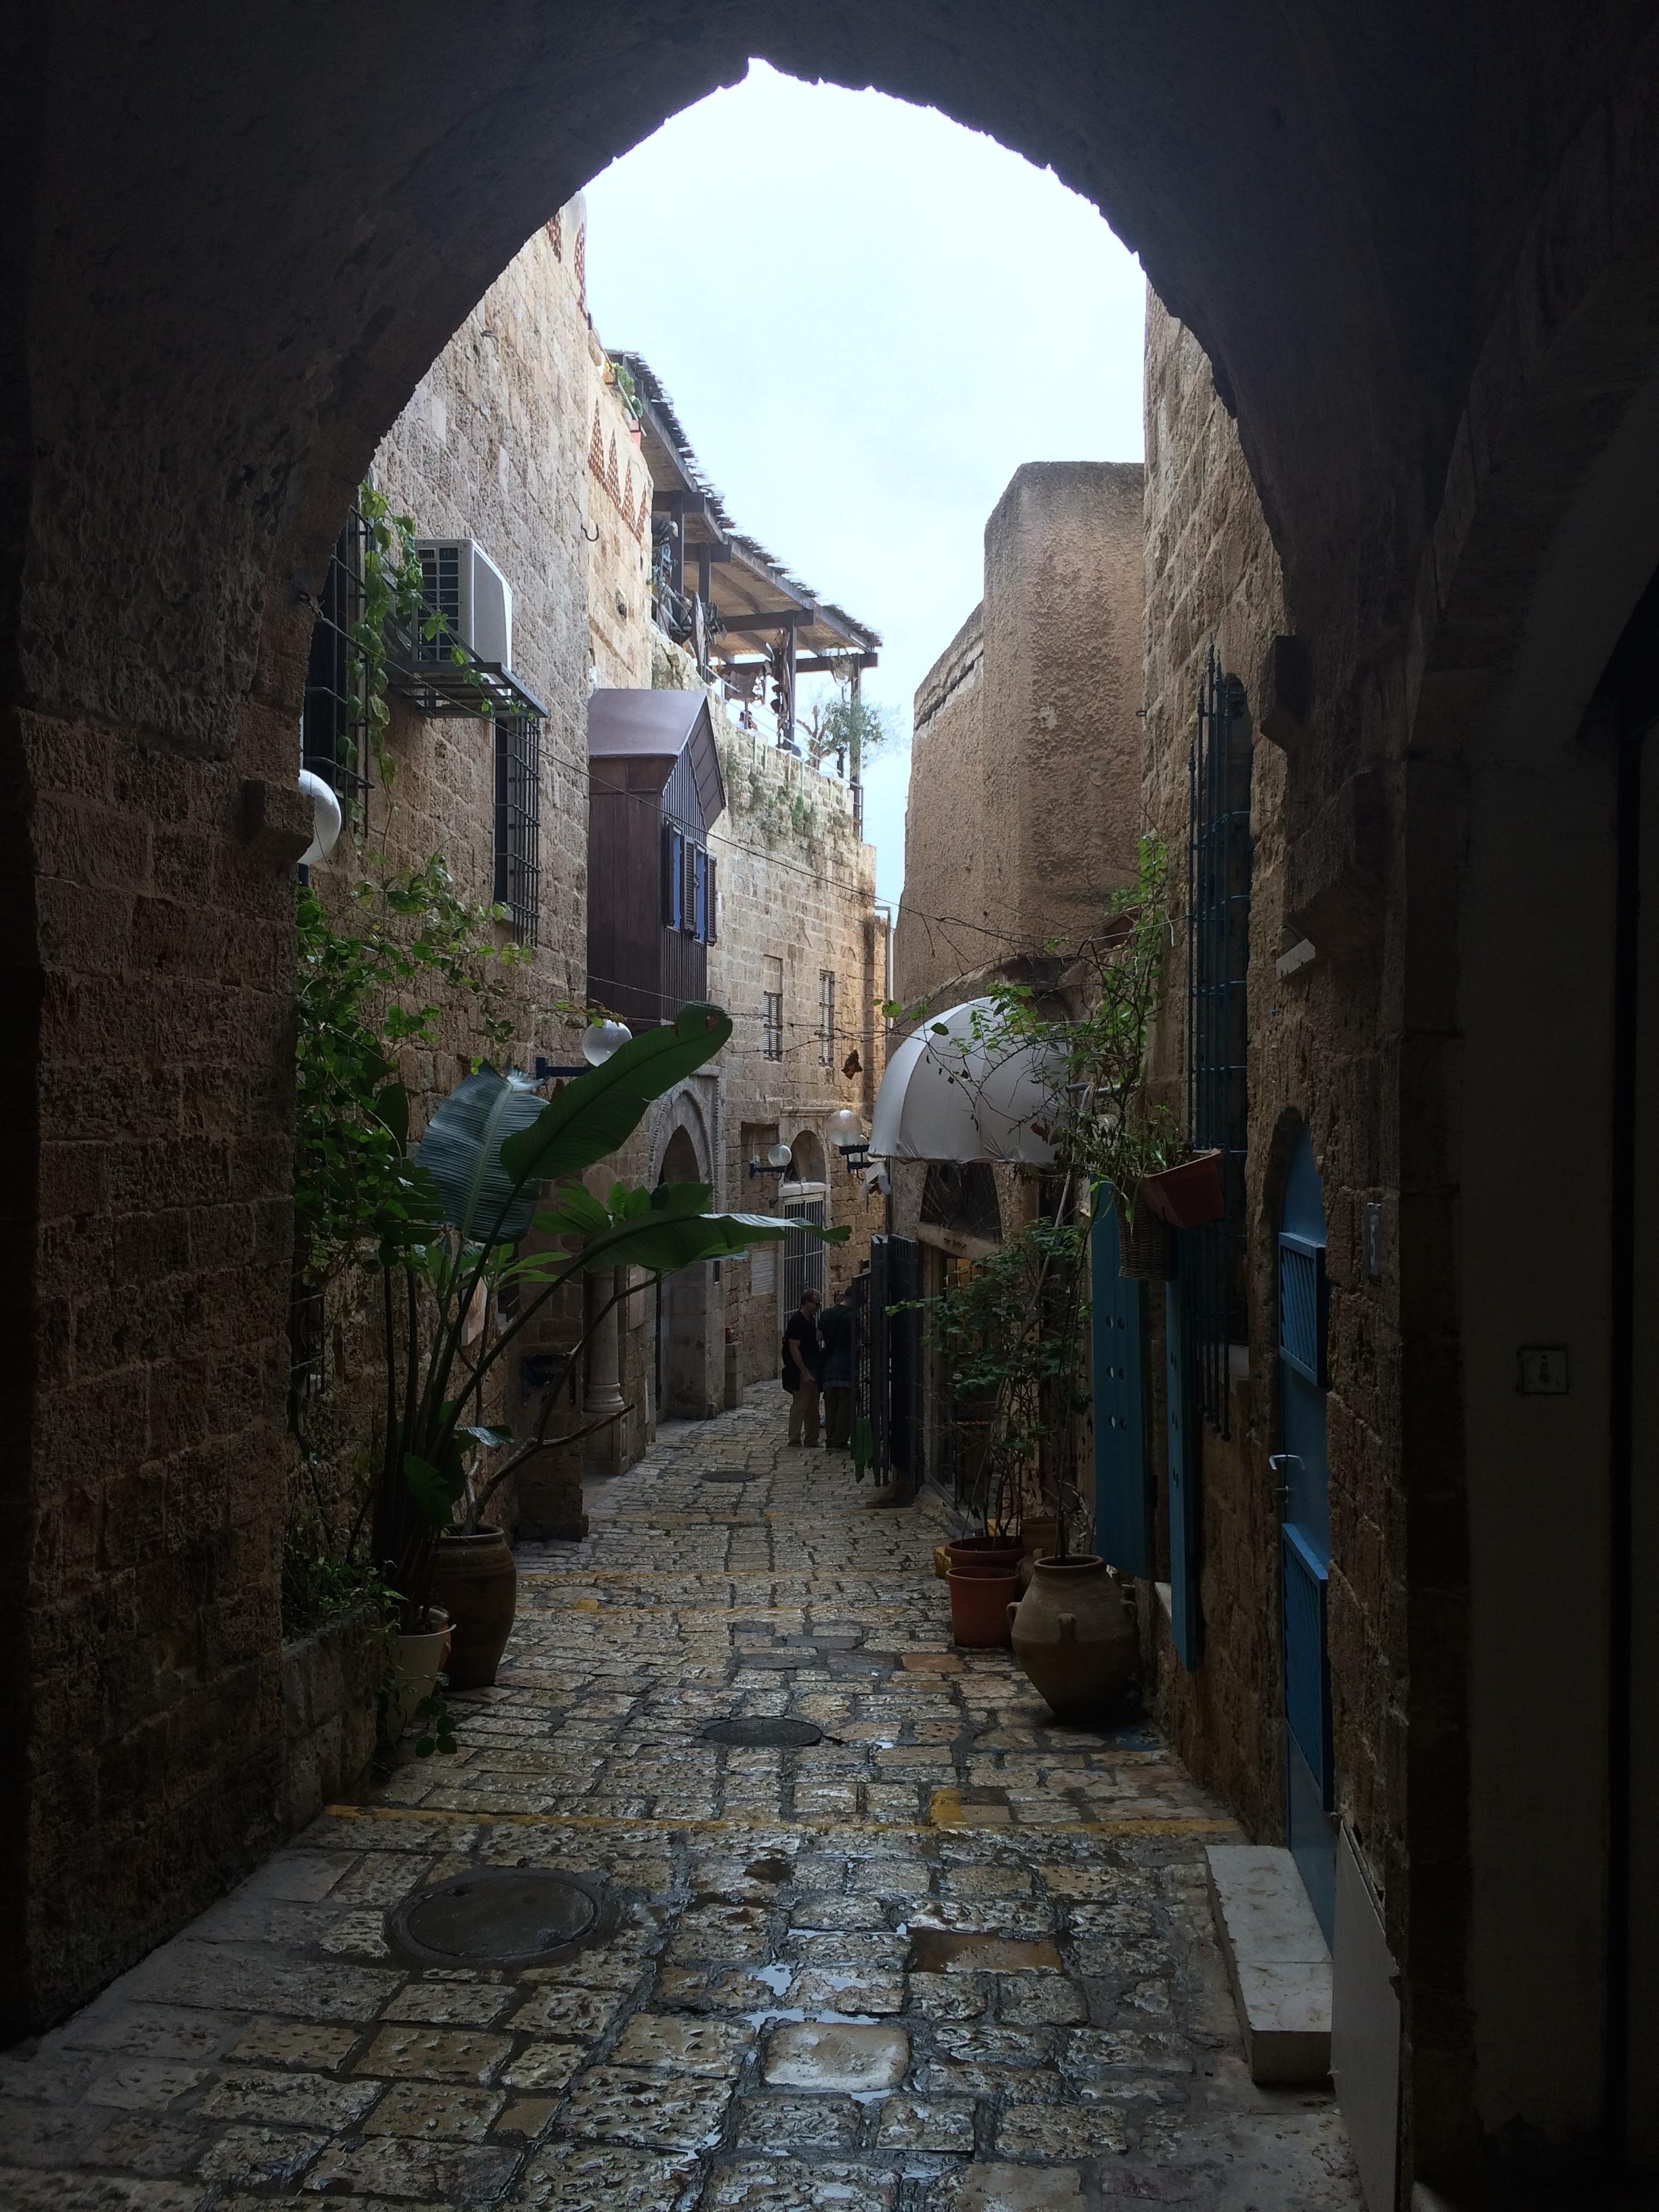 The old city streets of Jaffa in Tel Aviv.